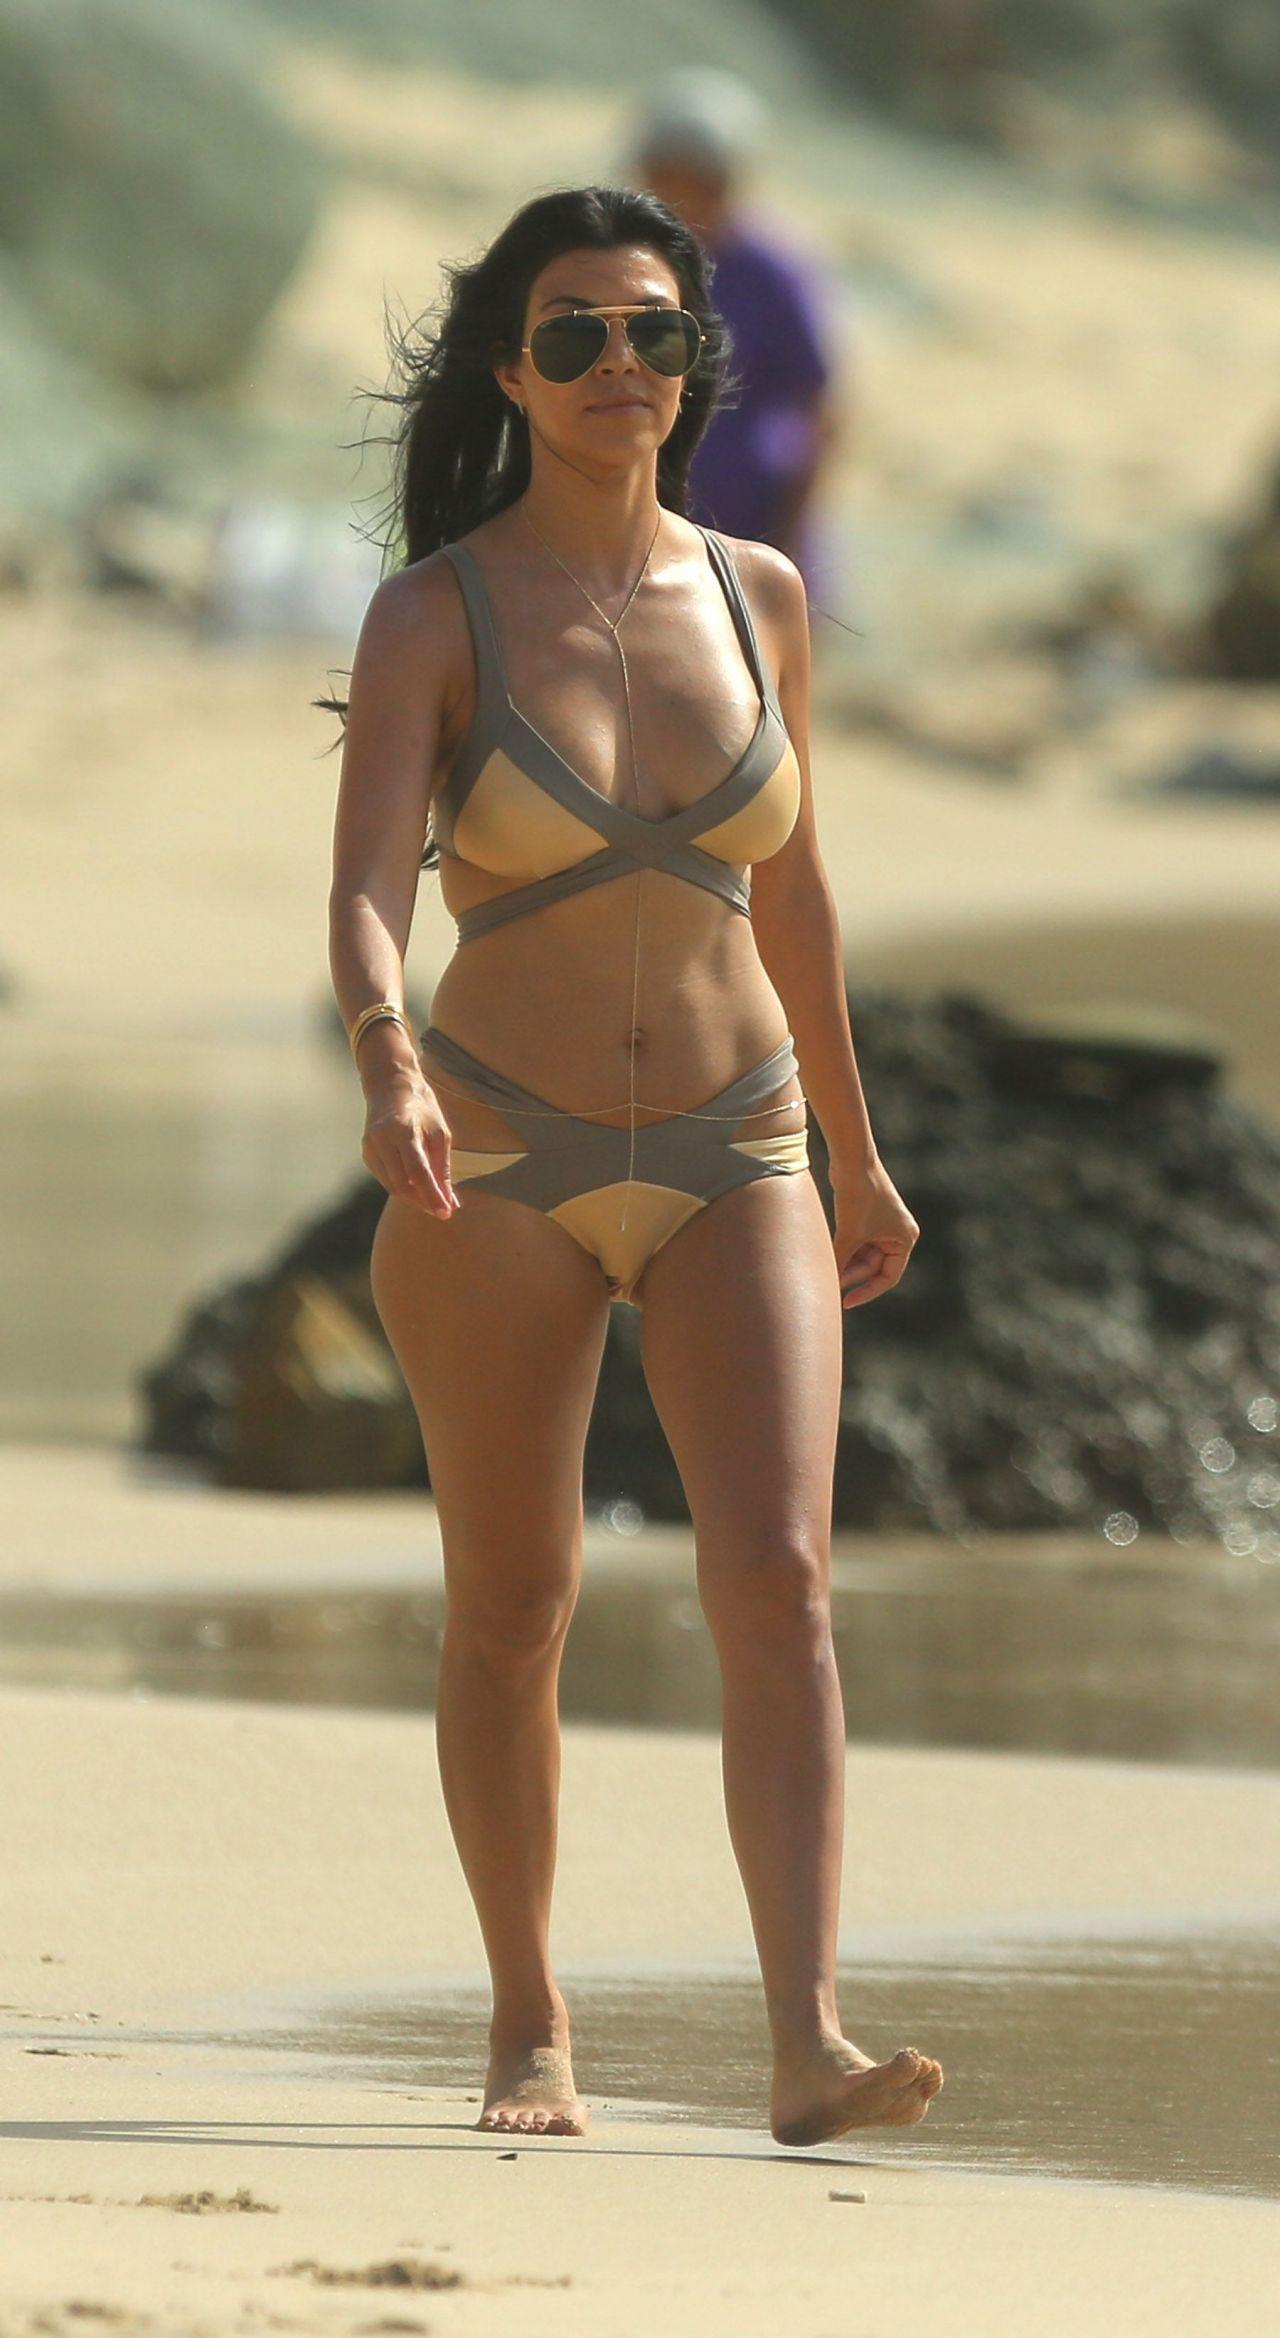 kourtney-kardashian-bikini-pics-on-vacation-at-the-beach-in-st.-barts-august-2015_1